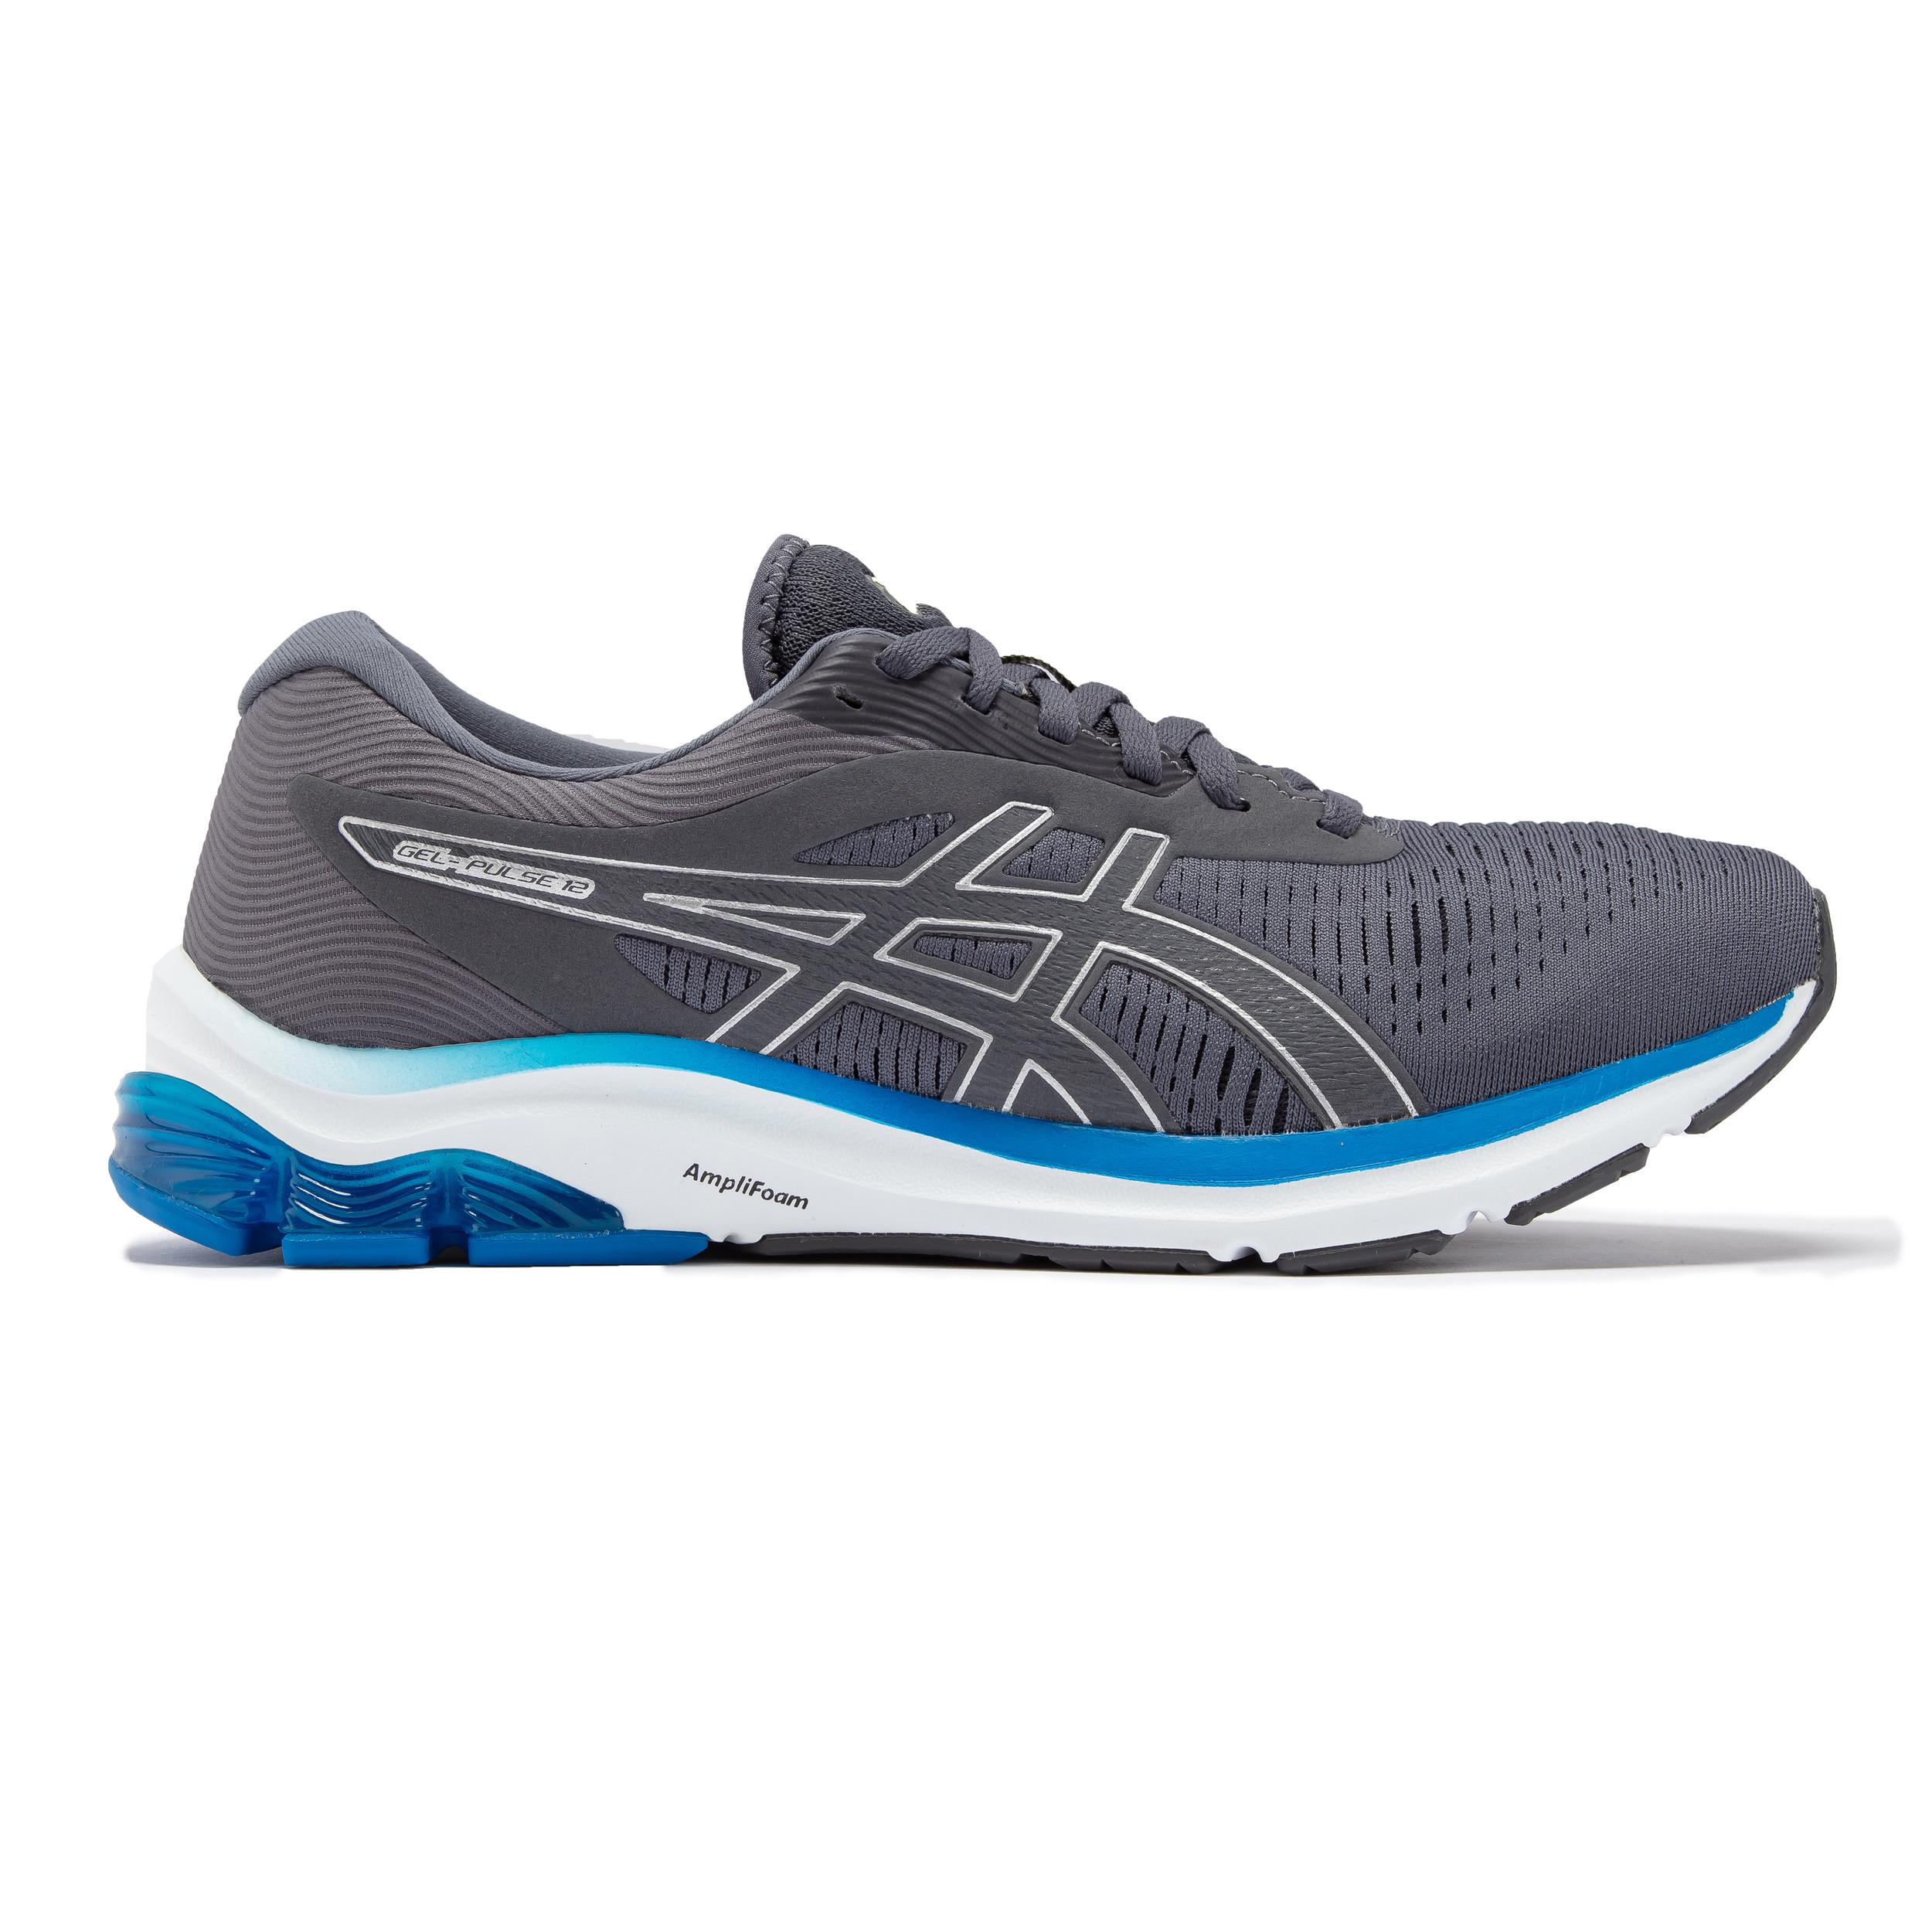 miniature 4 - Asics-Homme-Gel-Pulse-12-Chaussures-De-Course-Baskets-Sneakers-Bleu-Marine-Sports